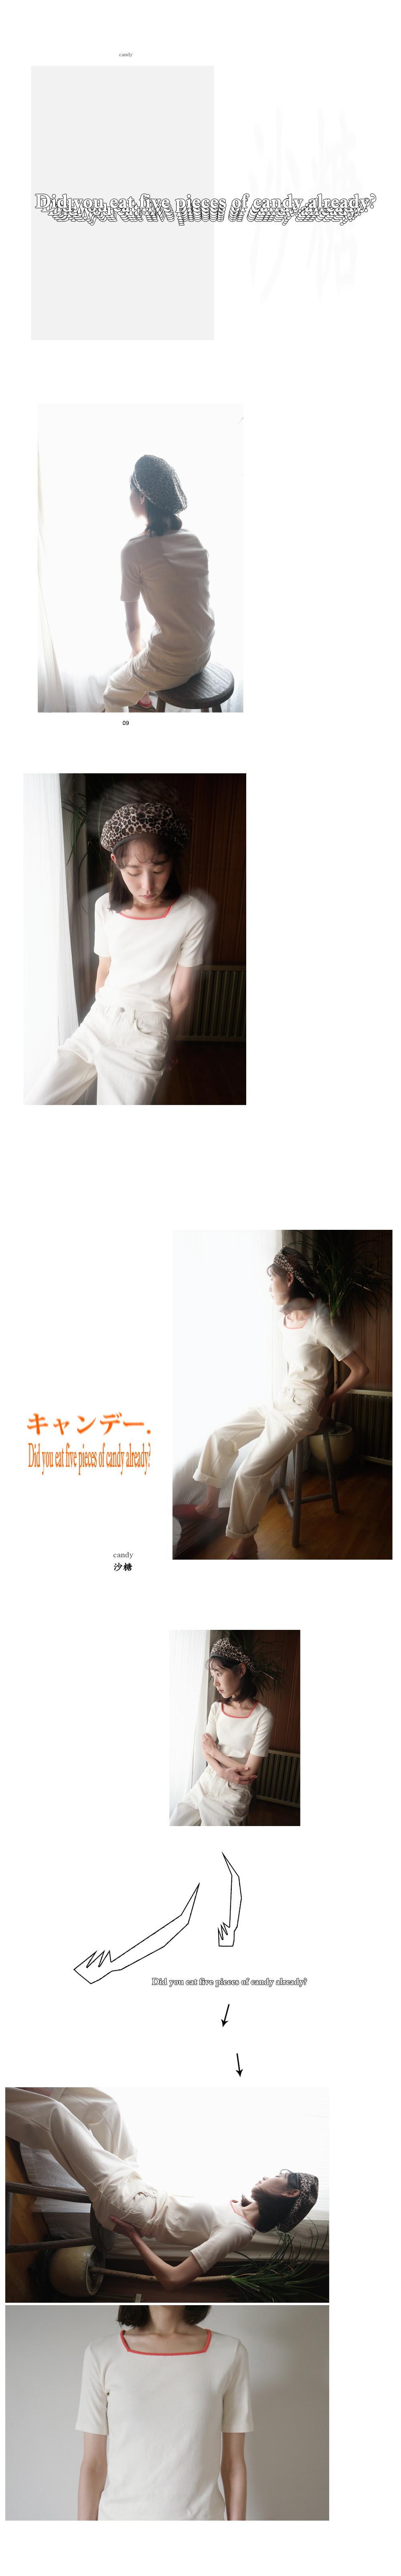 coloration neckline tee (4colors)